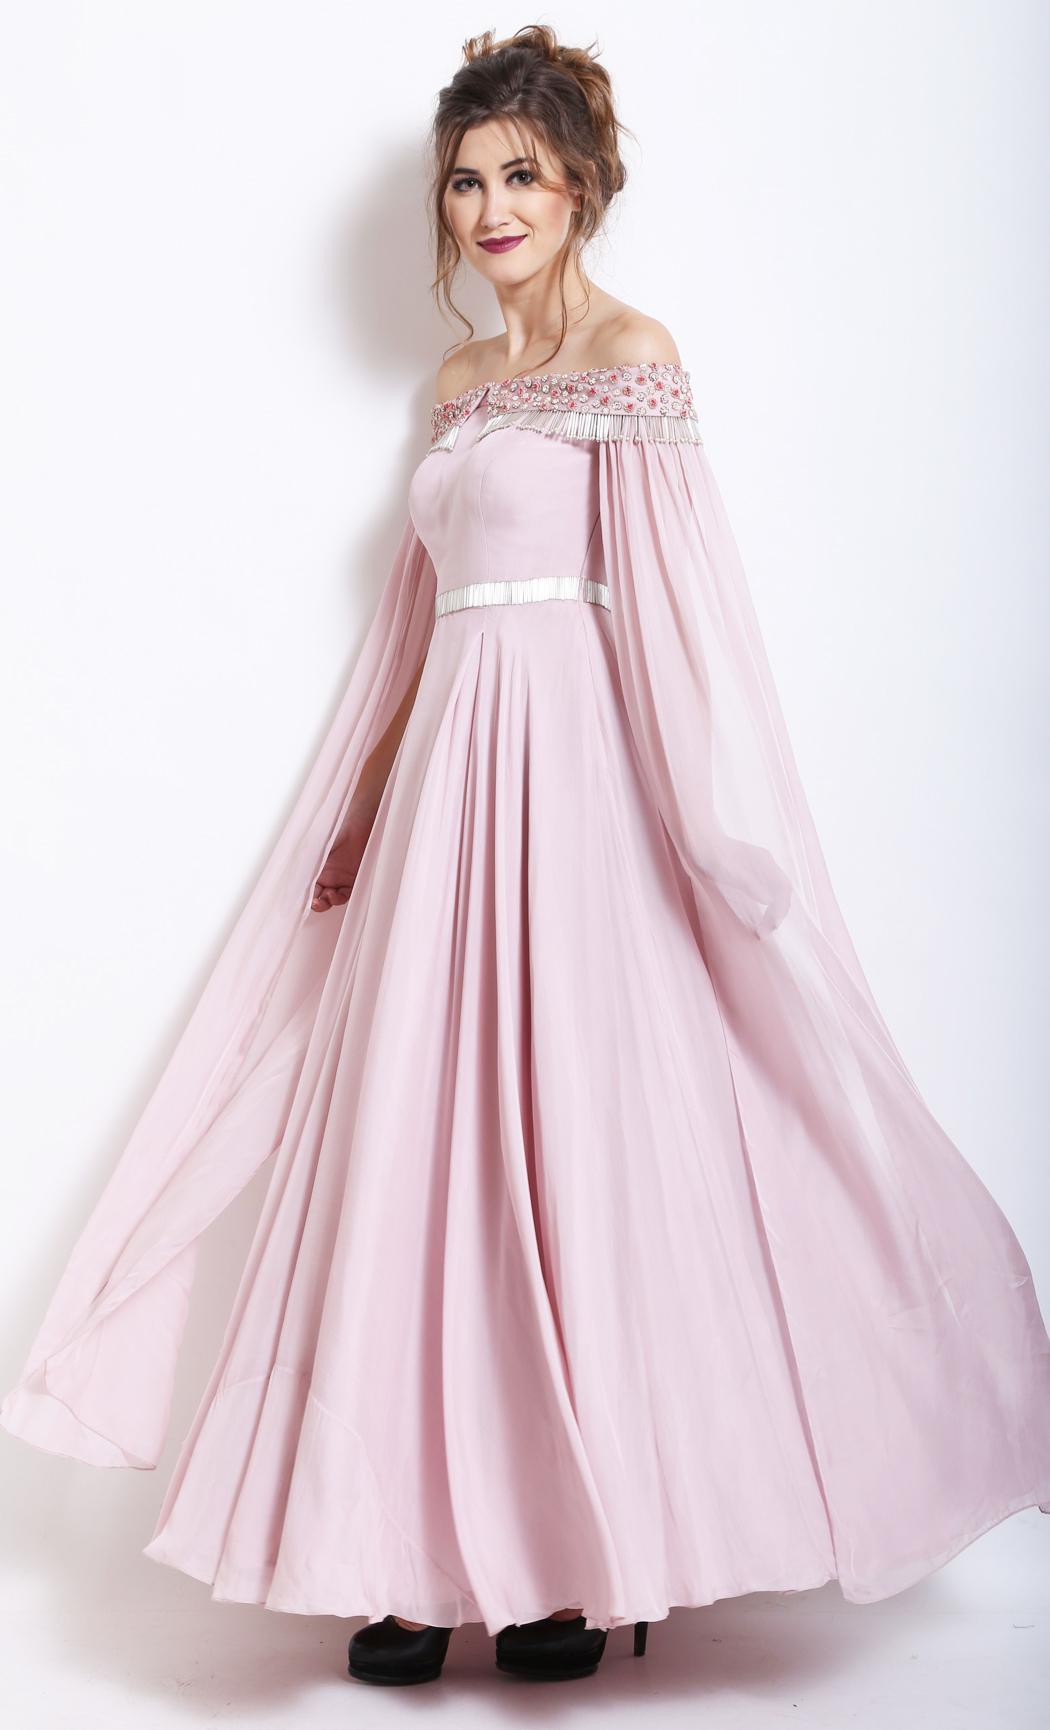 Thistle Off-Shoulder Dress Kurta - Buy Online